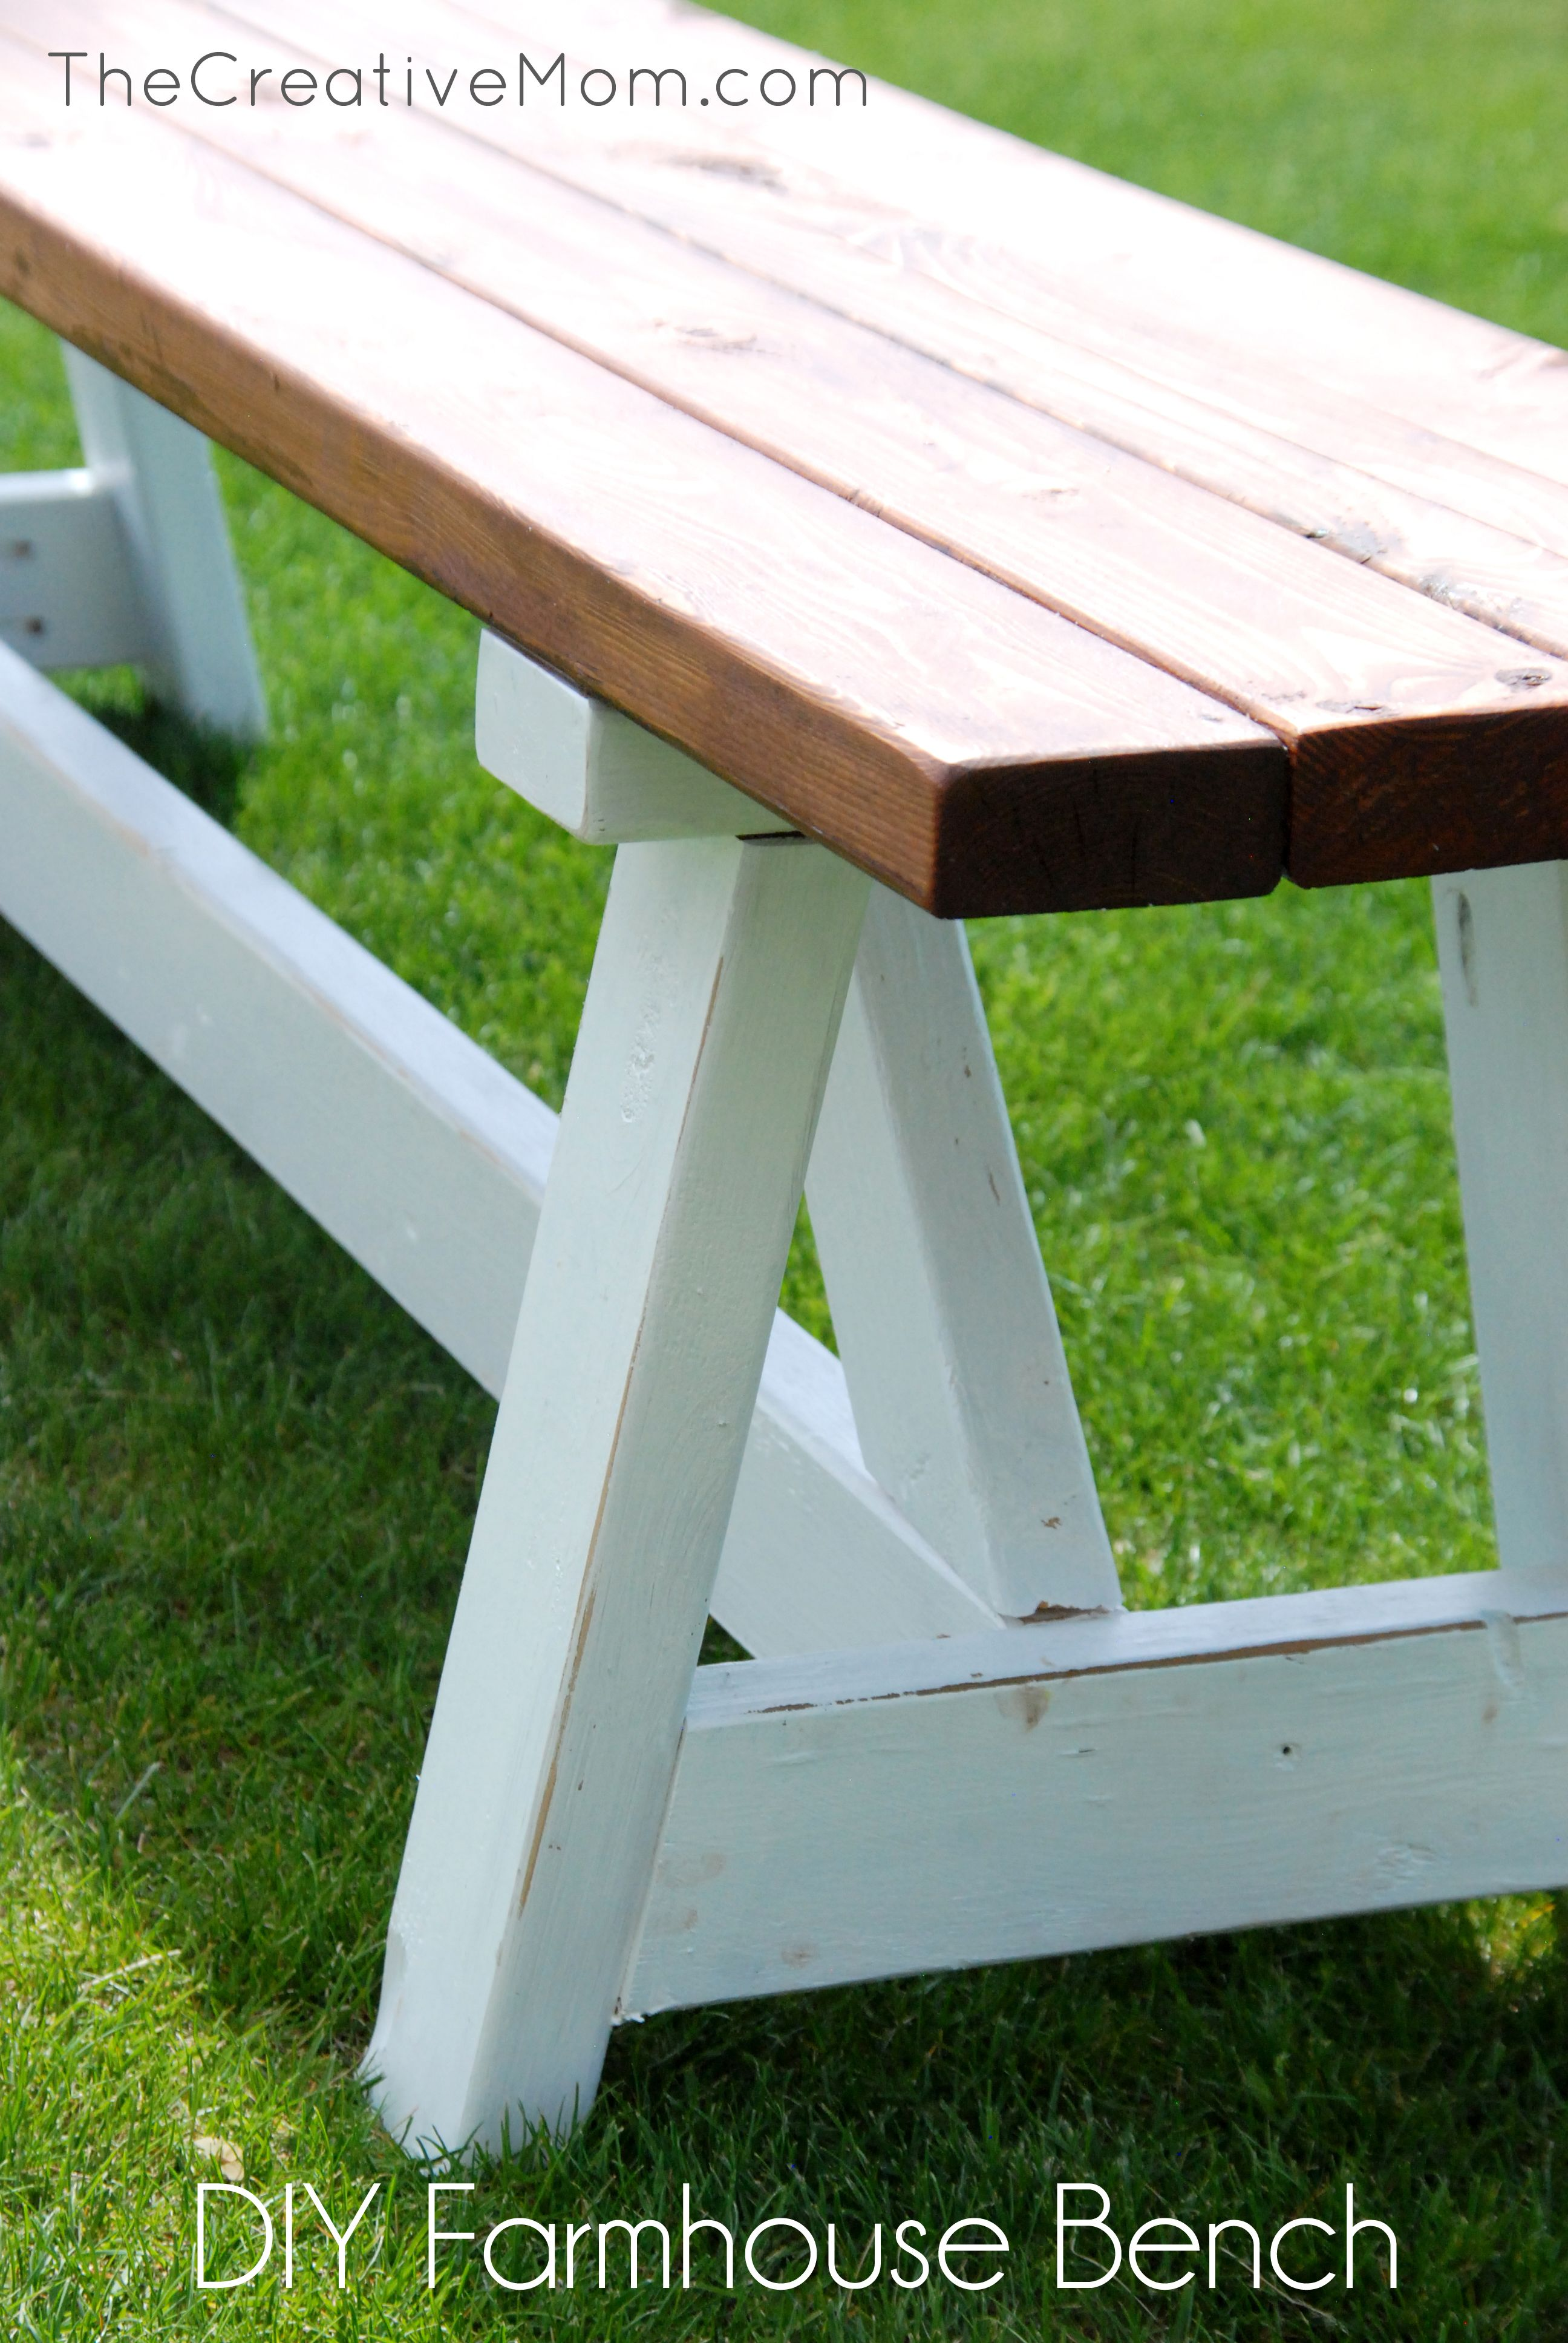 how to build a farmhouse bench | Diy | Pinterest | Bancos y Jardín